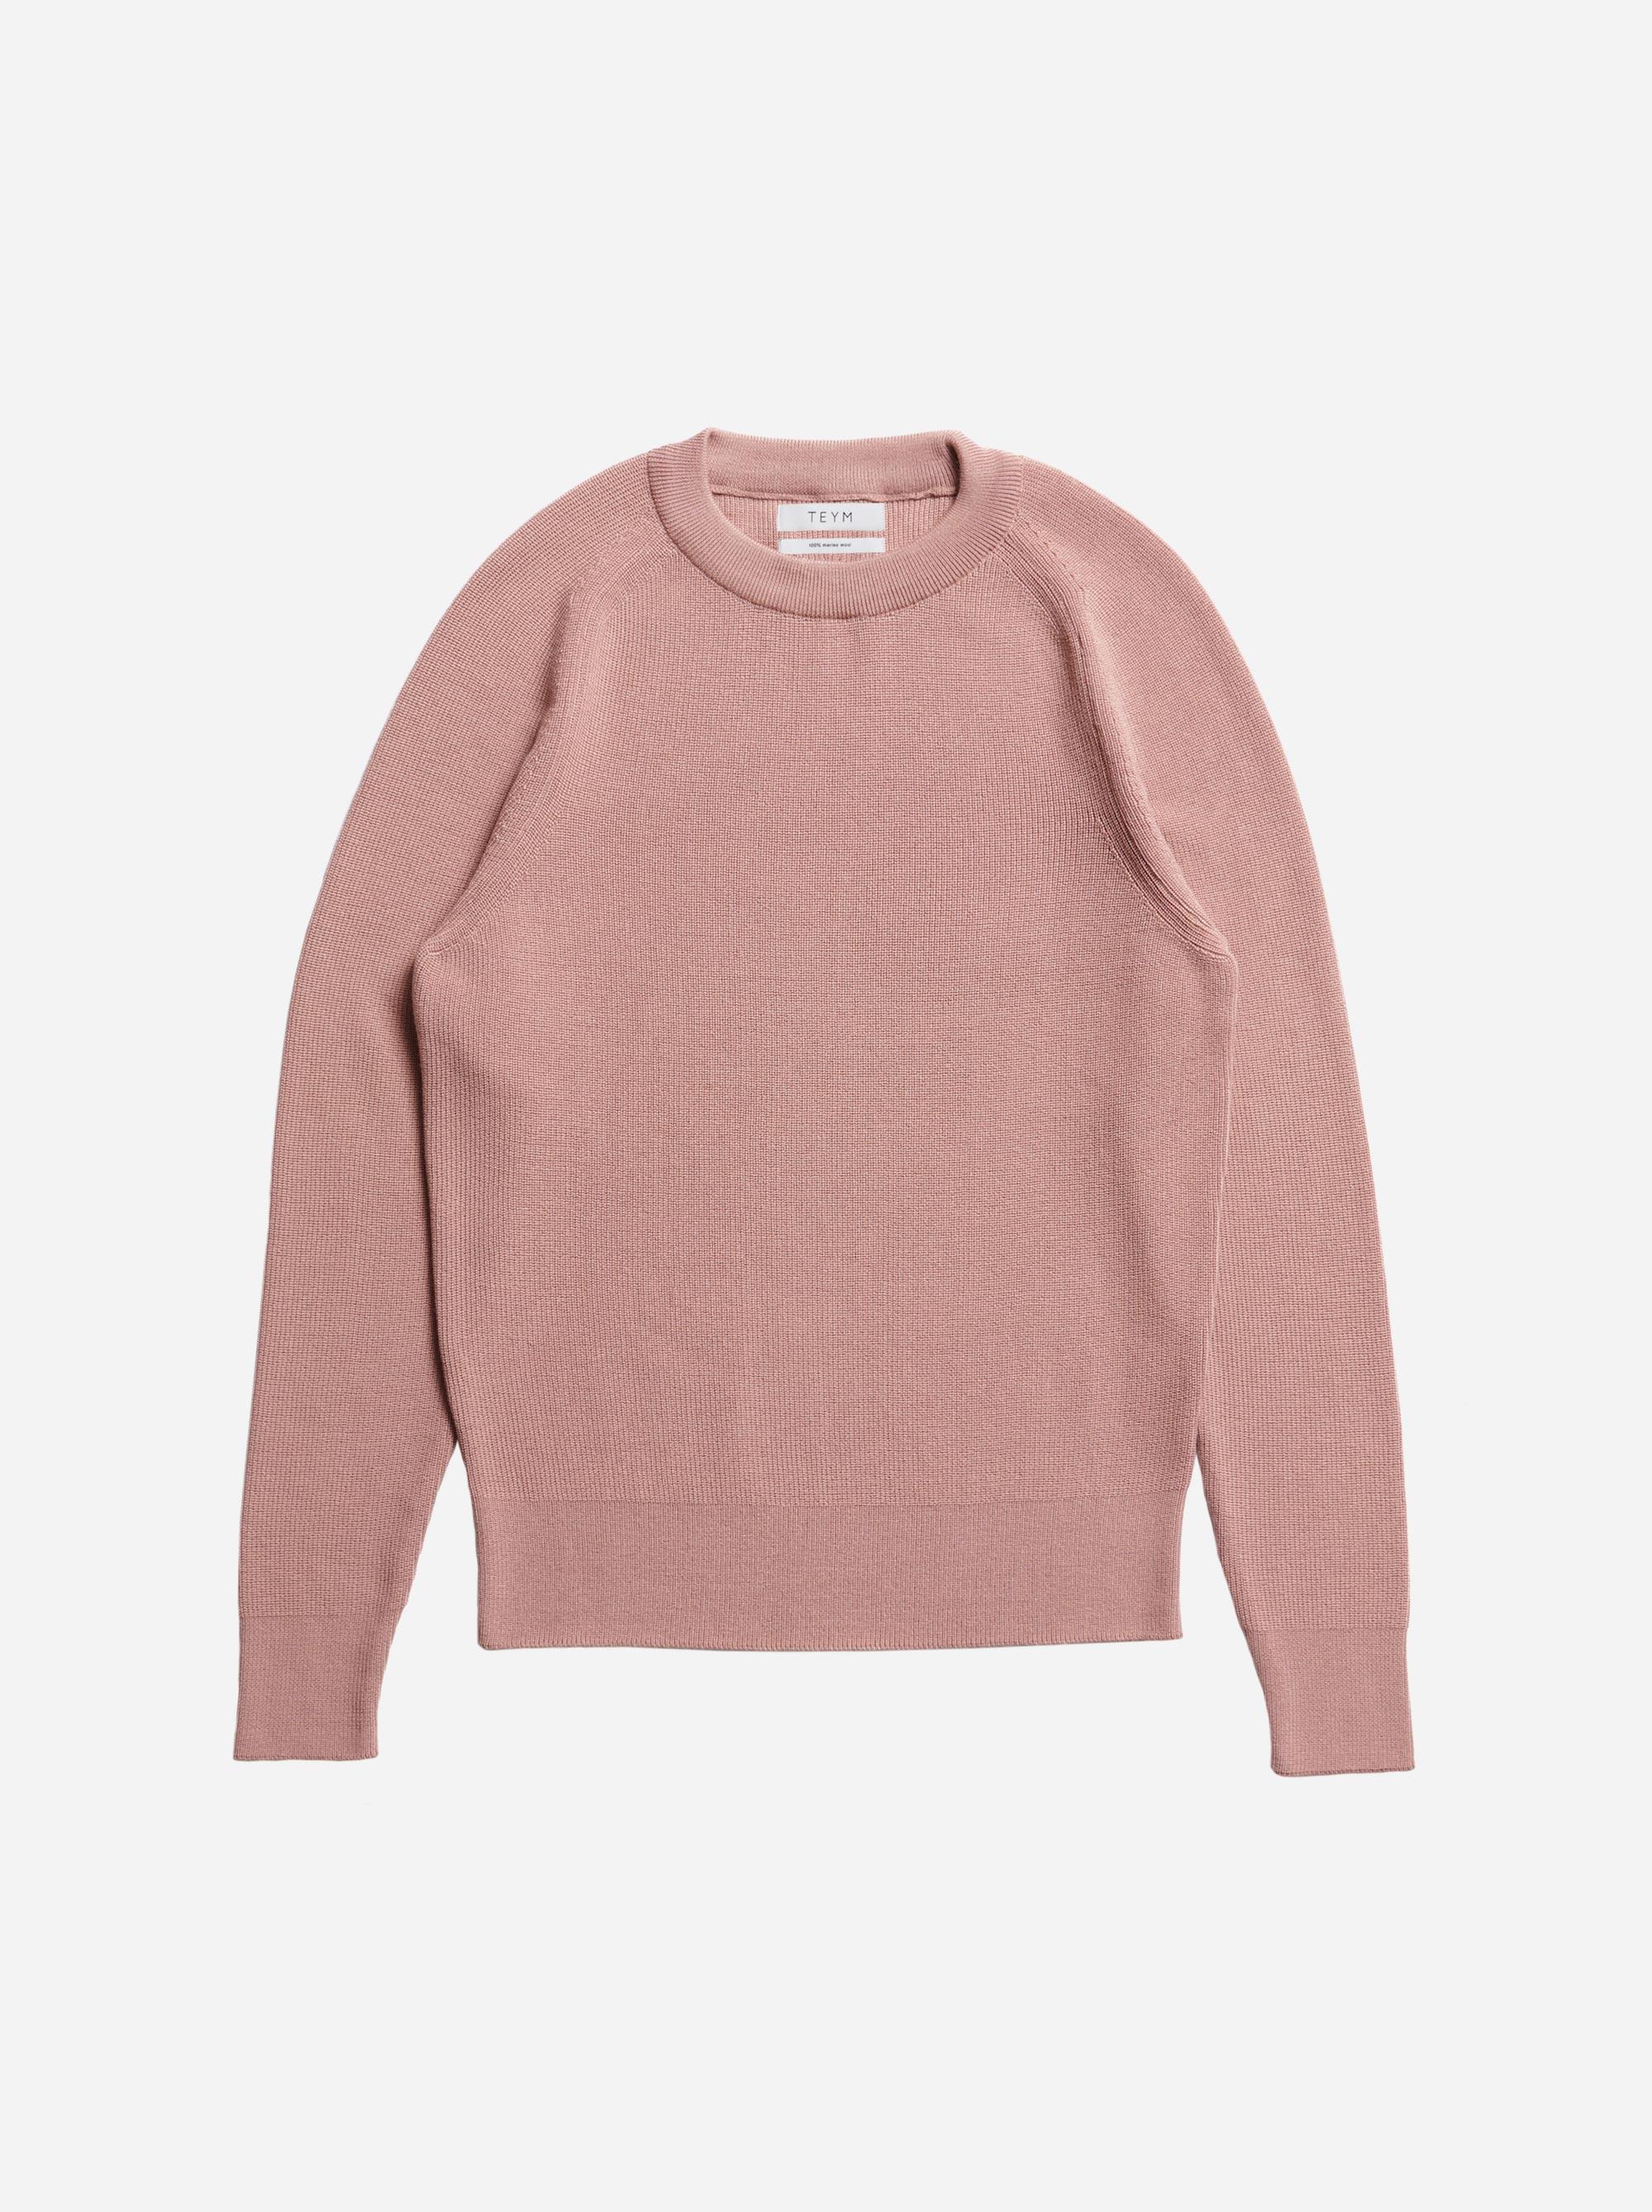 Teym - Crewneck - The Merino Sweater - Women - Pink - 4